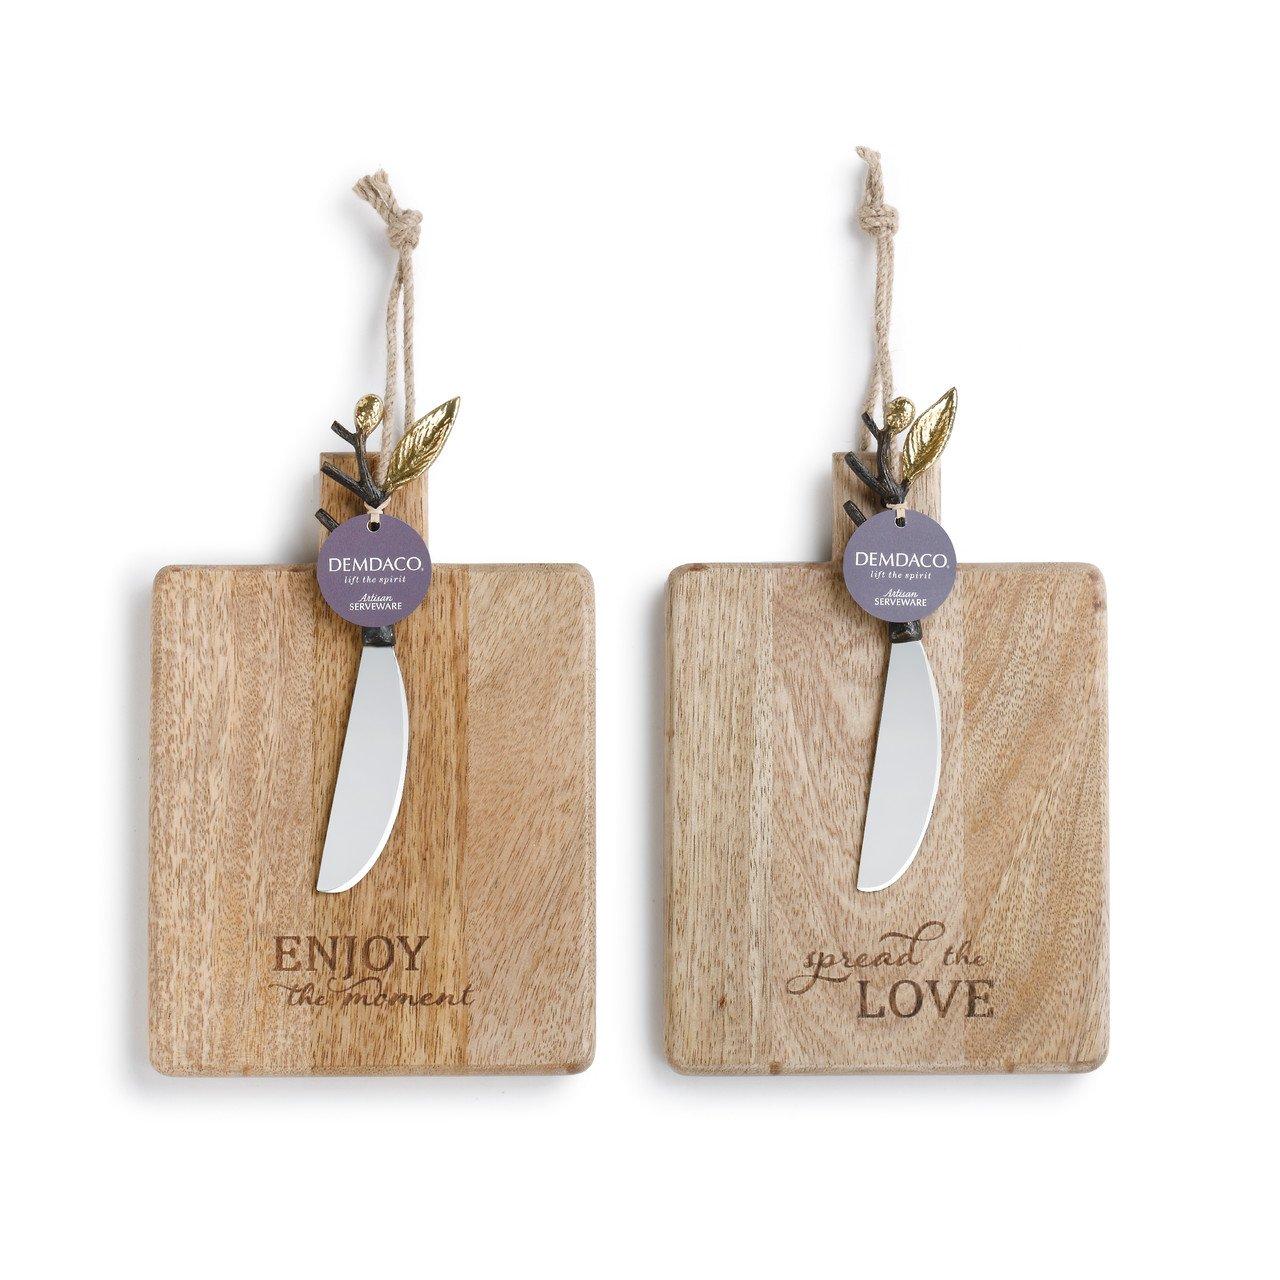 Love Enjoy Brown 9 x 6 Mango Wood Serving Boards and Spreaders Assorted Set of 2 Demdaco 1004200007